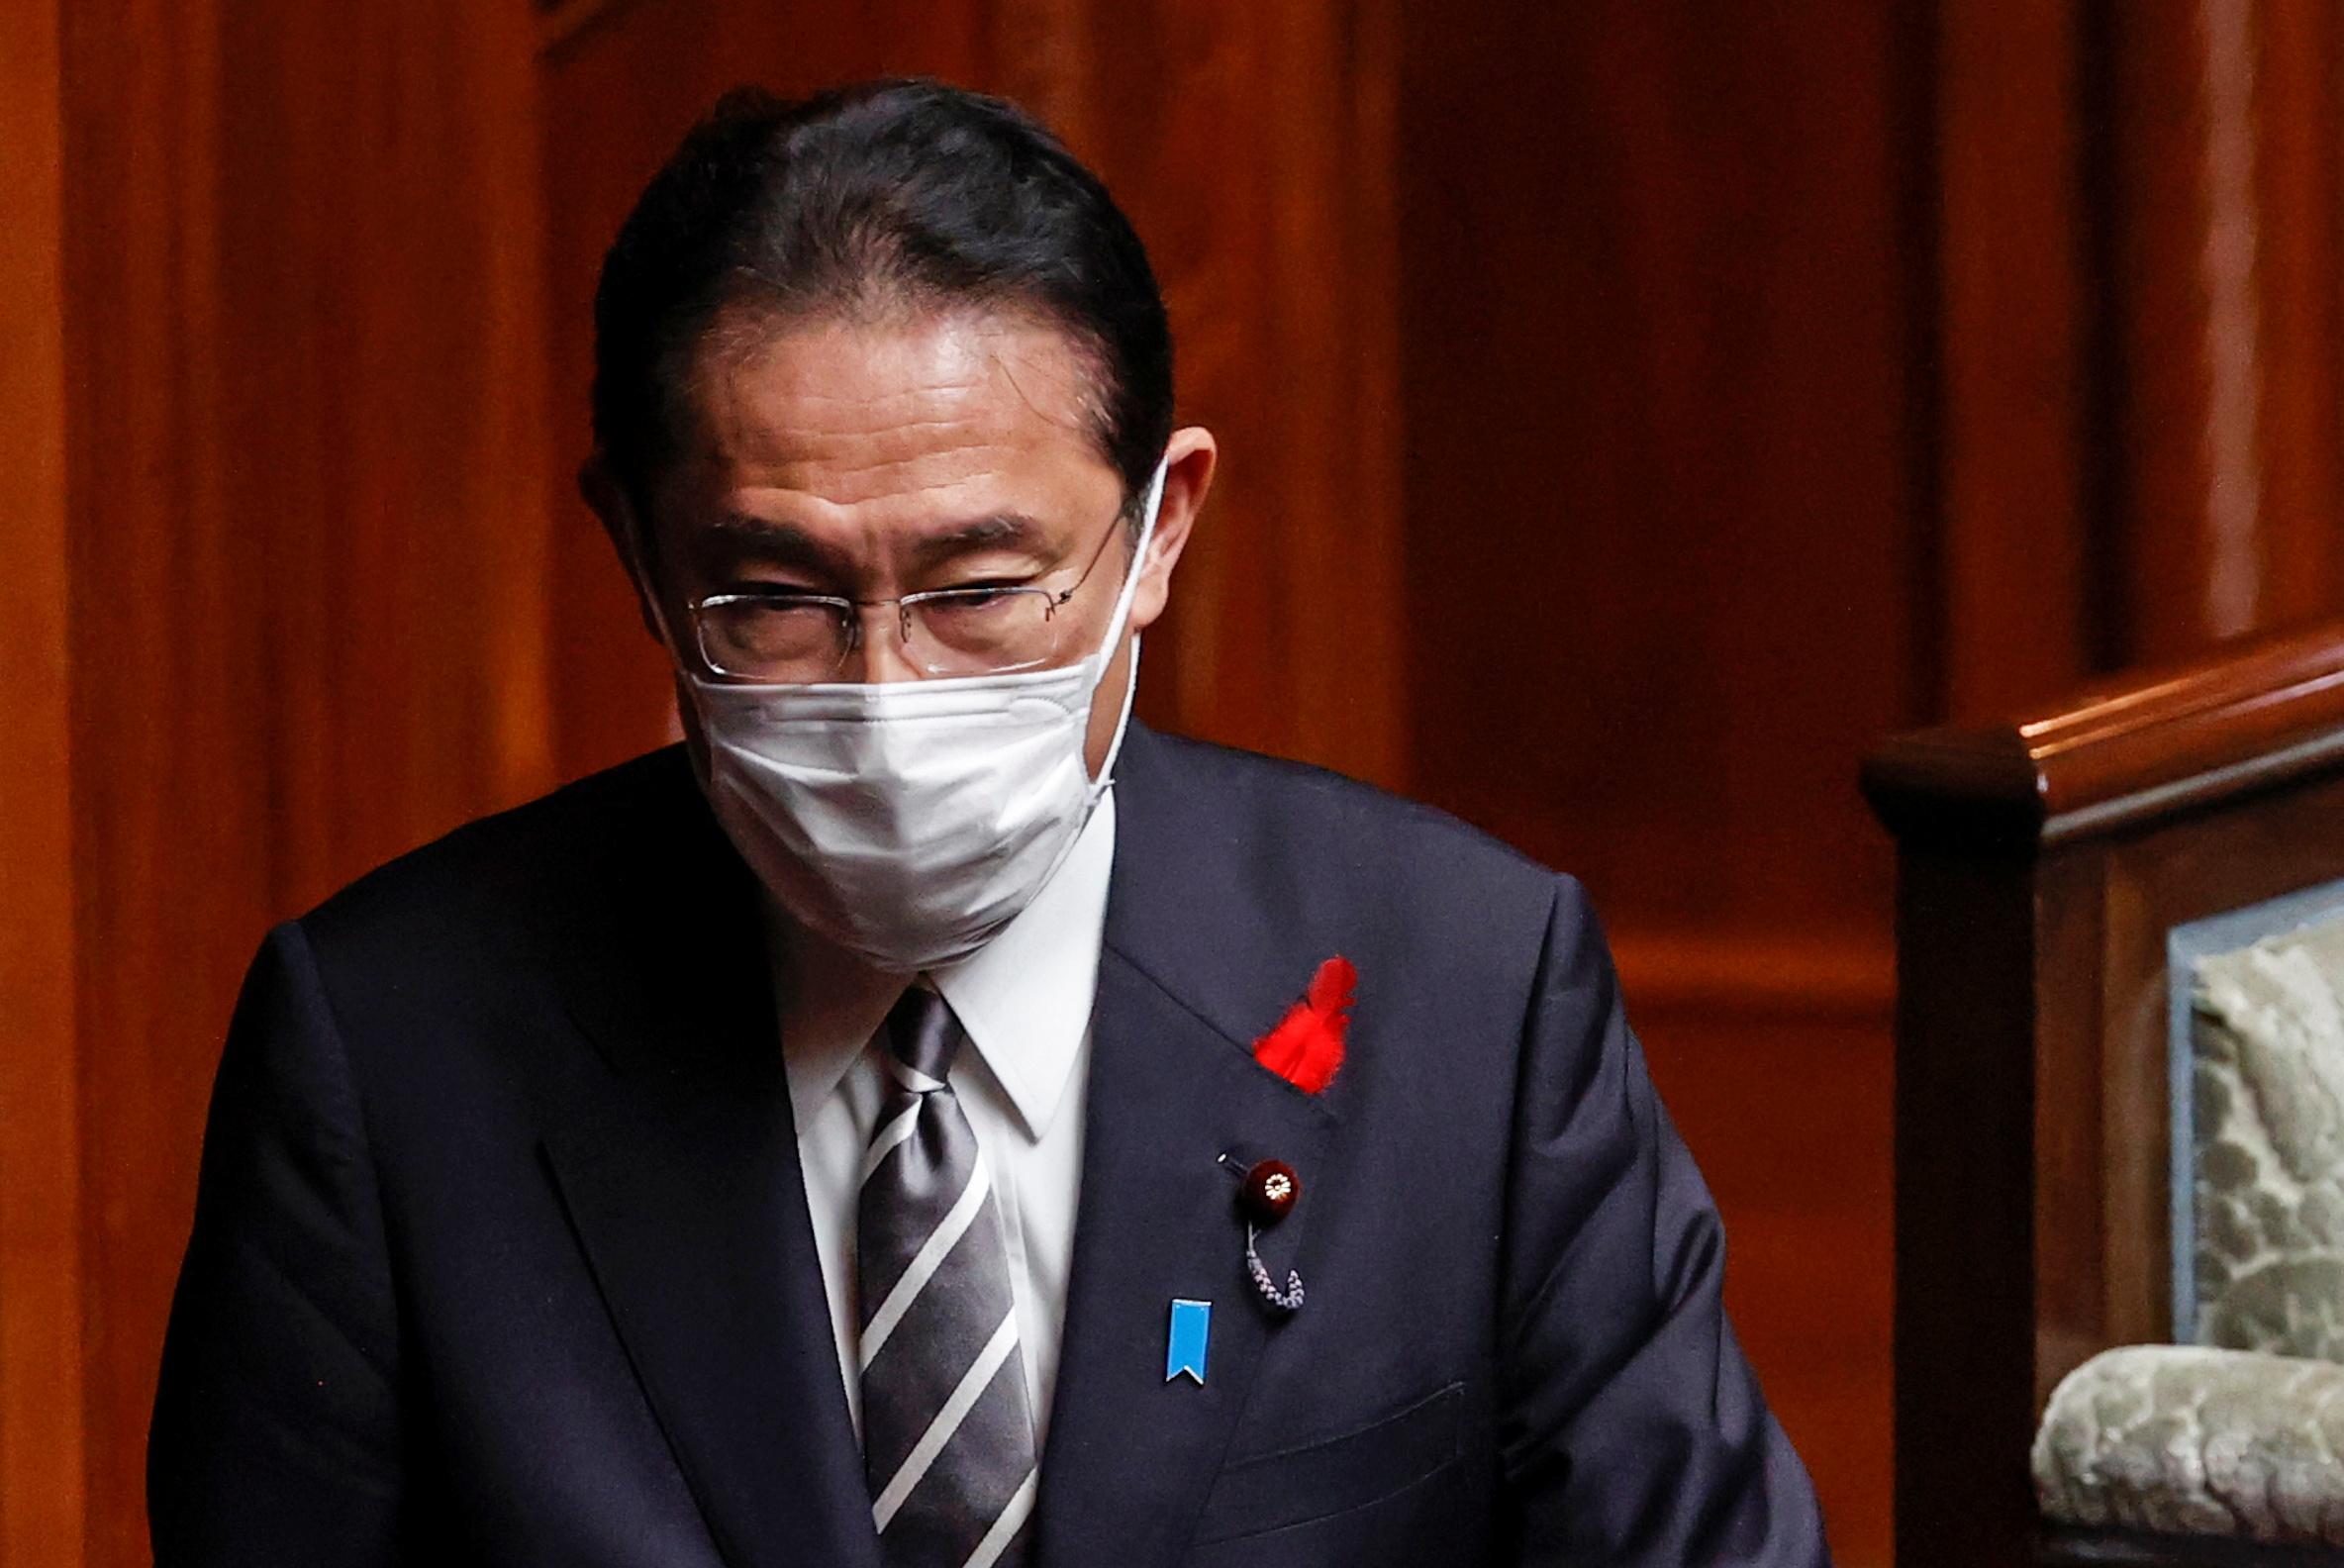 Japan's Prime Minister Fumio Kishida arrives at the Parliament in Tokyo, Japan October 14, 2021. REUTERS/Kim Kyung-Hoon